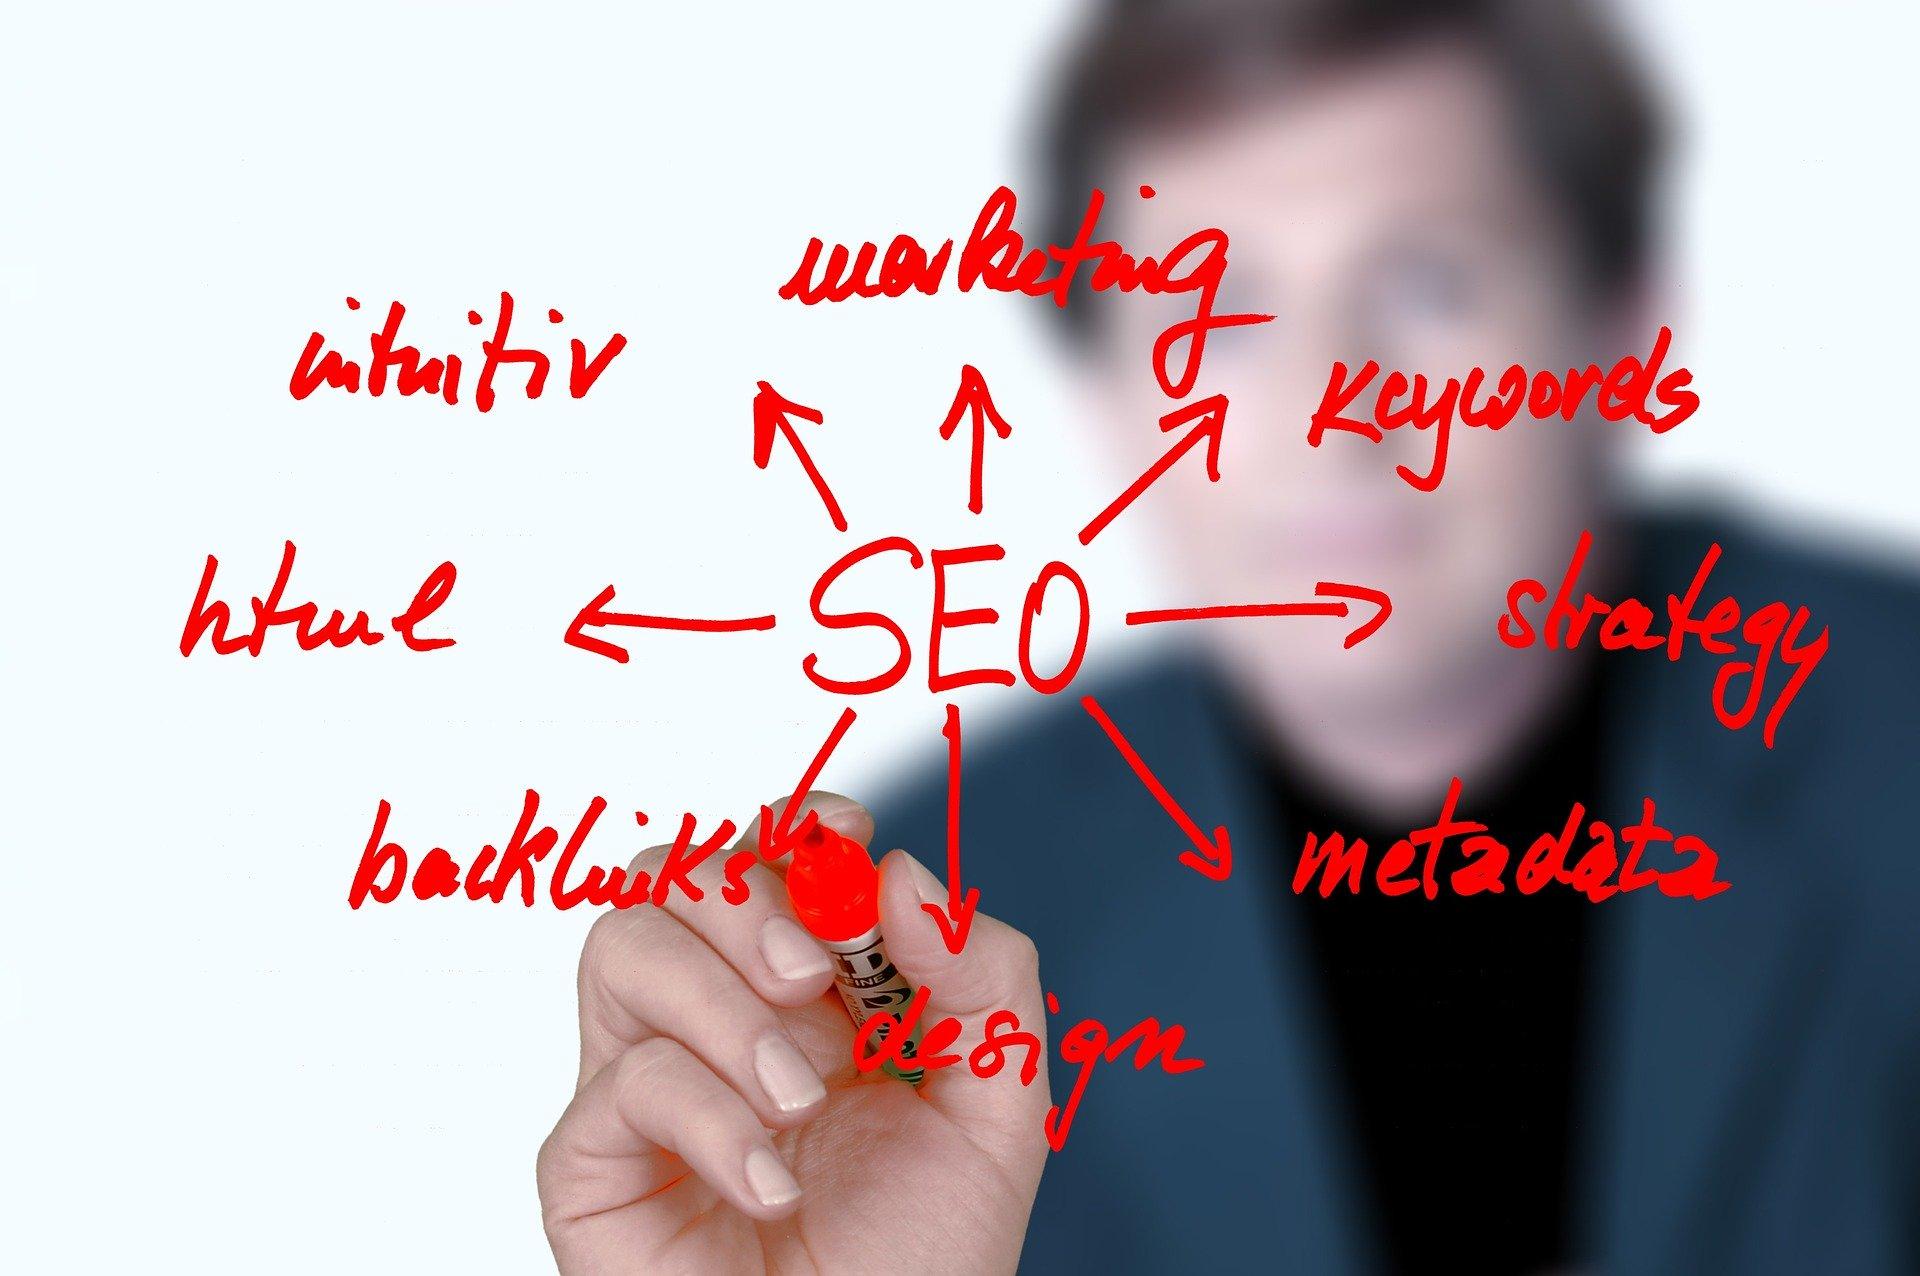 search-engine-optimization-1359429_1920